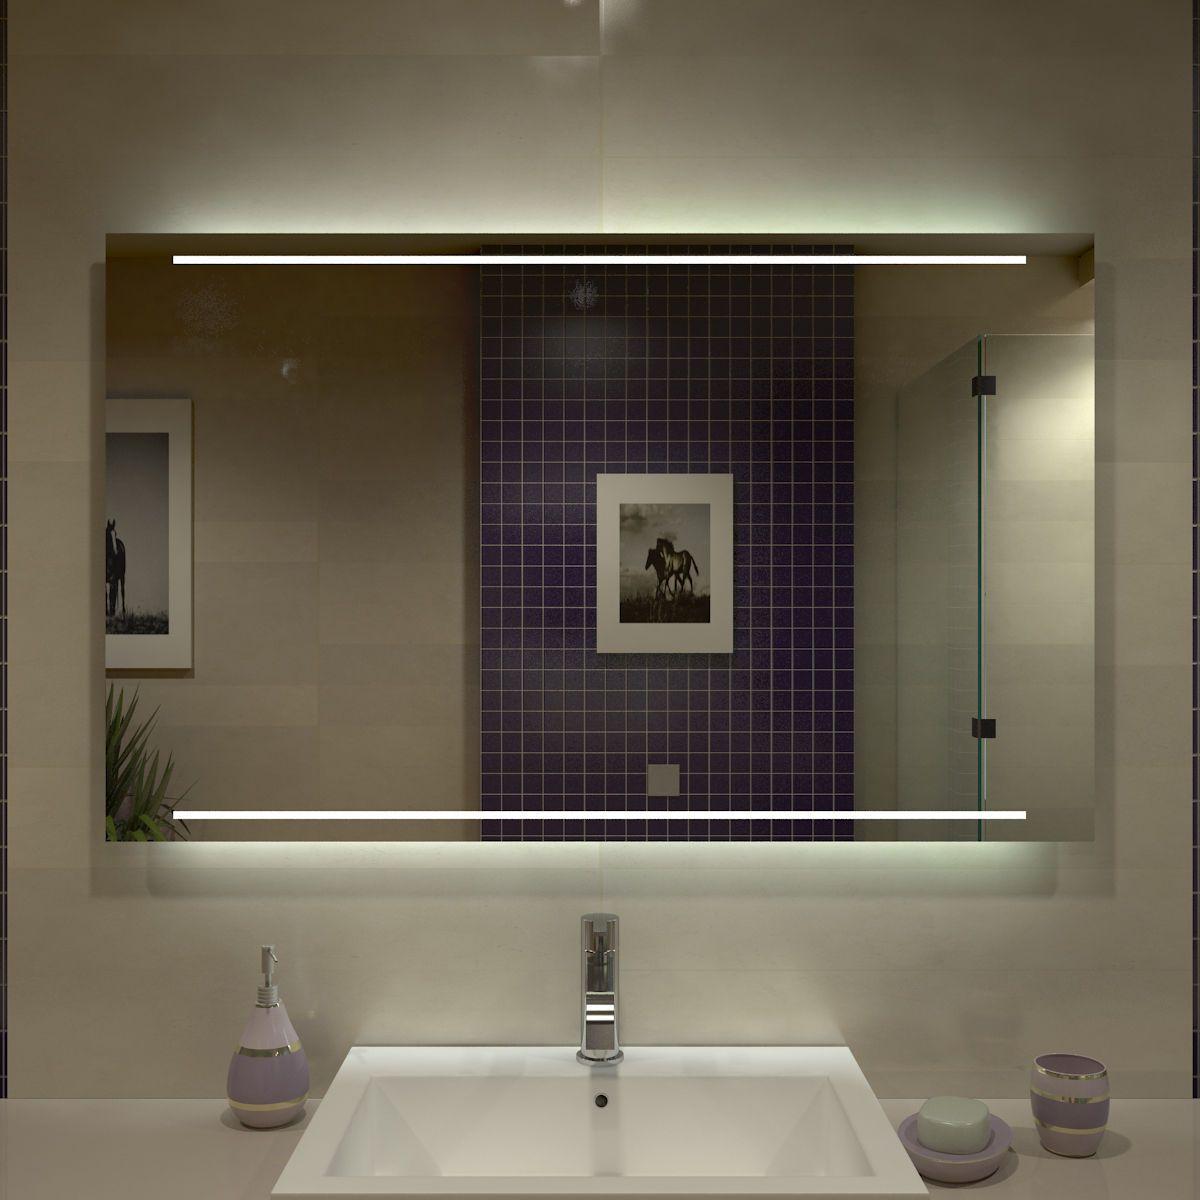 Ayna Ve Banyo Aynalari Fiyatlari Ayna Modelleri Com Led Spiegel Badspiegel Led